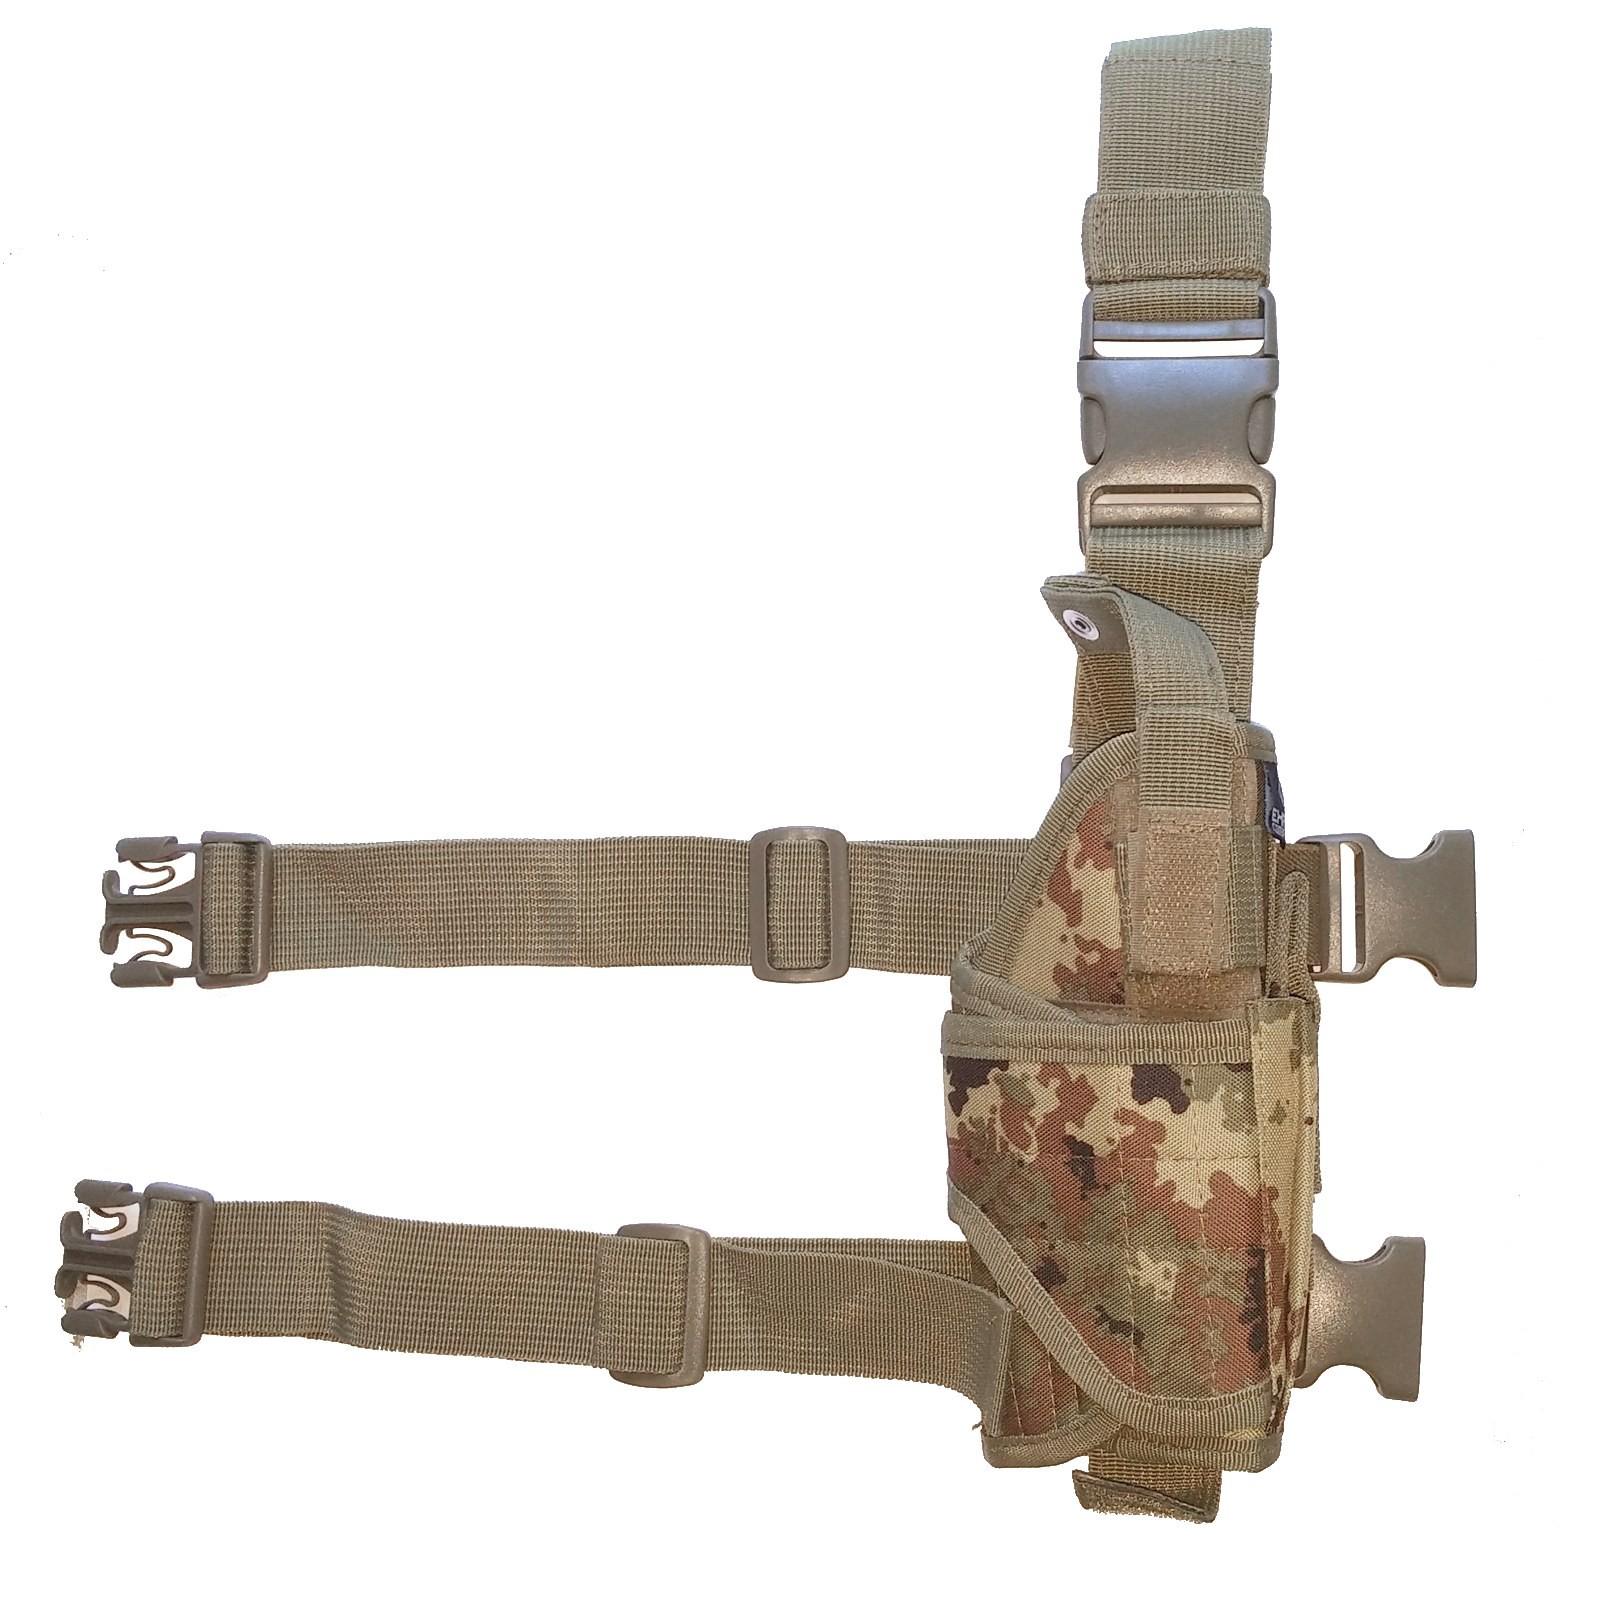 Fondina Cosciale Militare per Pistola Exagon Softair Tactical Vegetata